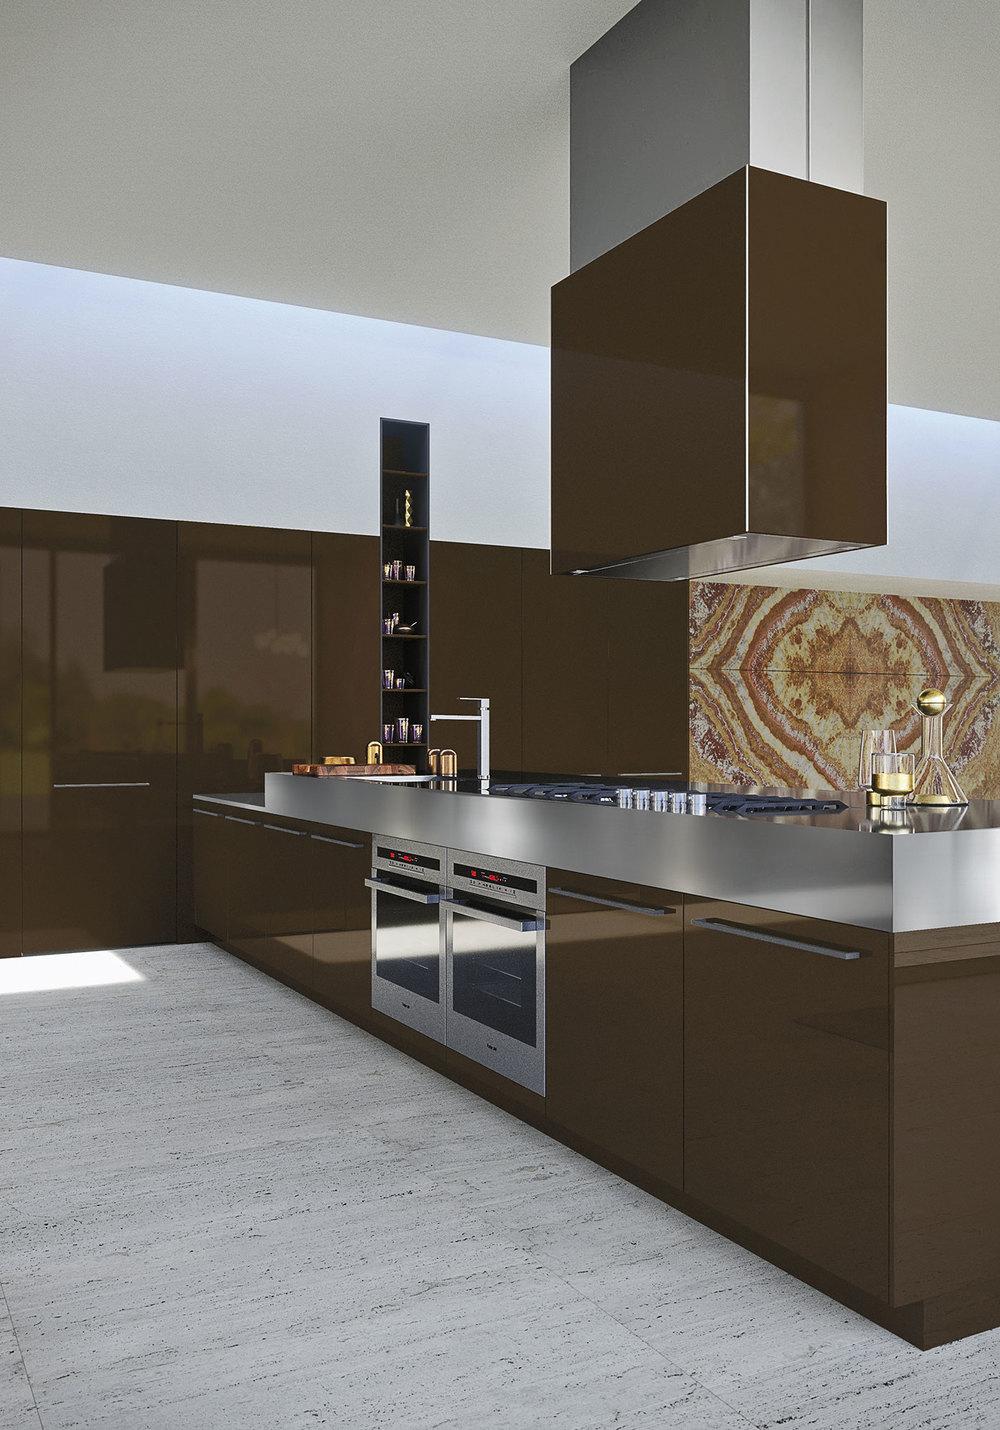 cucina-dettaglio-Opera-absolute-brown-1.jpg